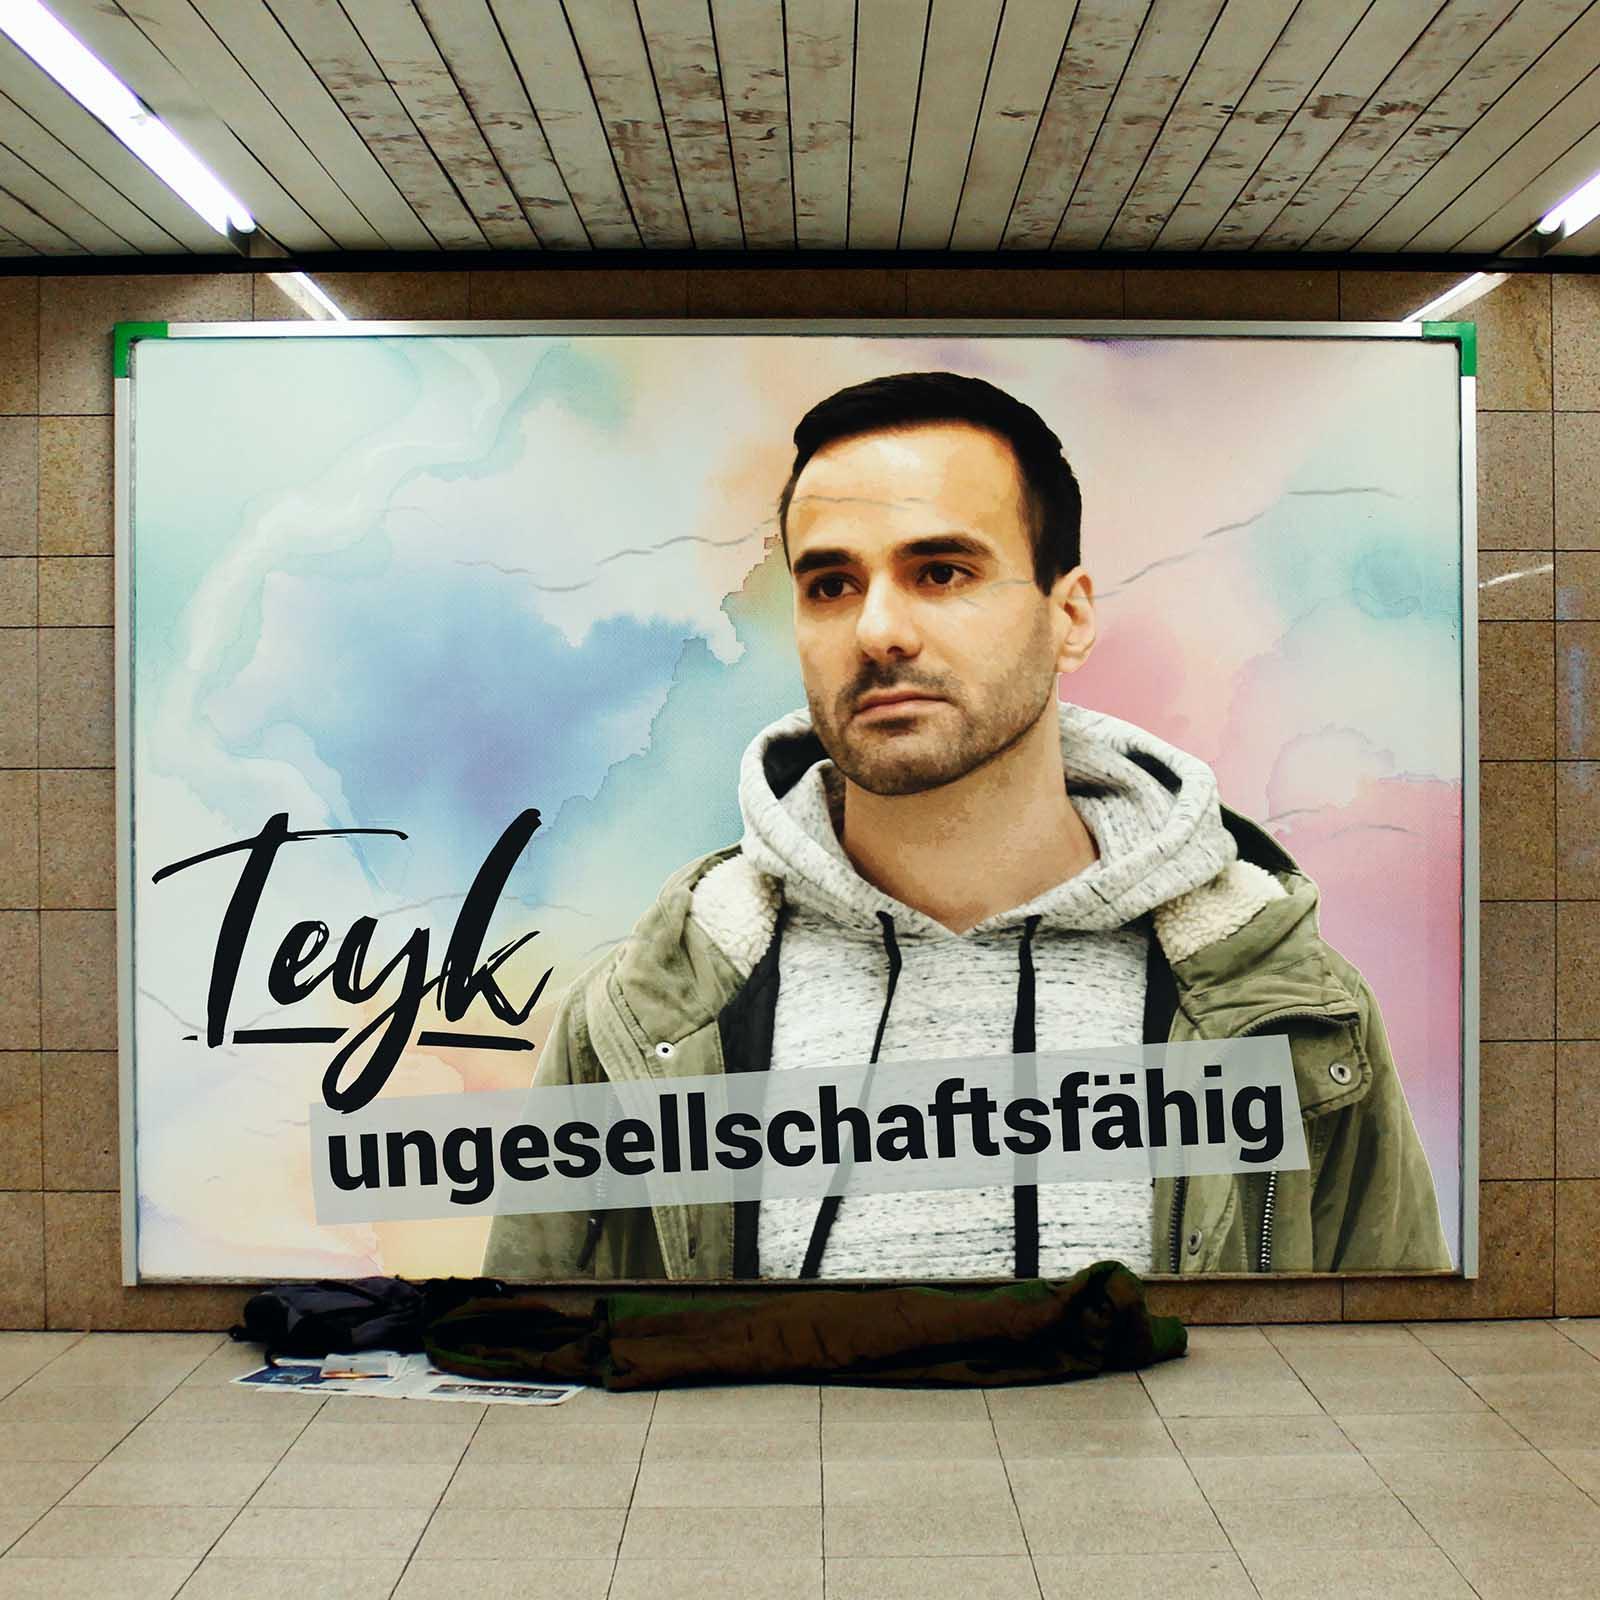 Upcoming: Teyk - Ungesellschaftsfähig